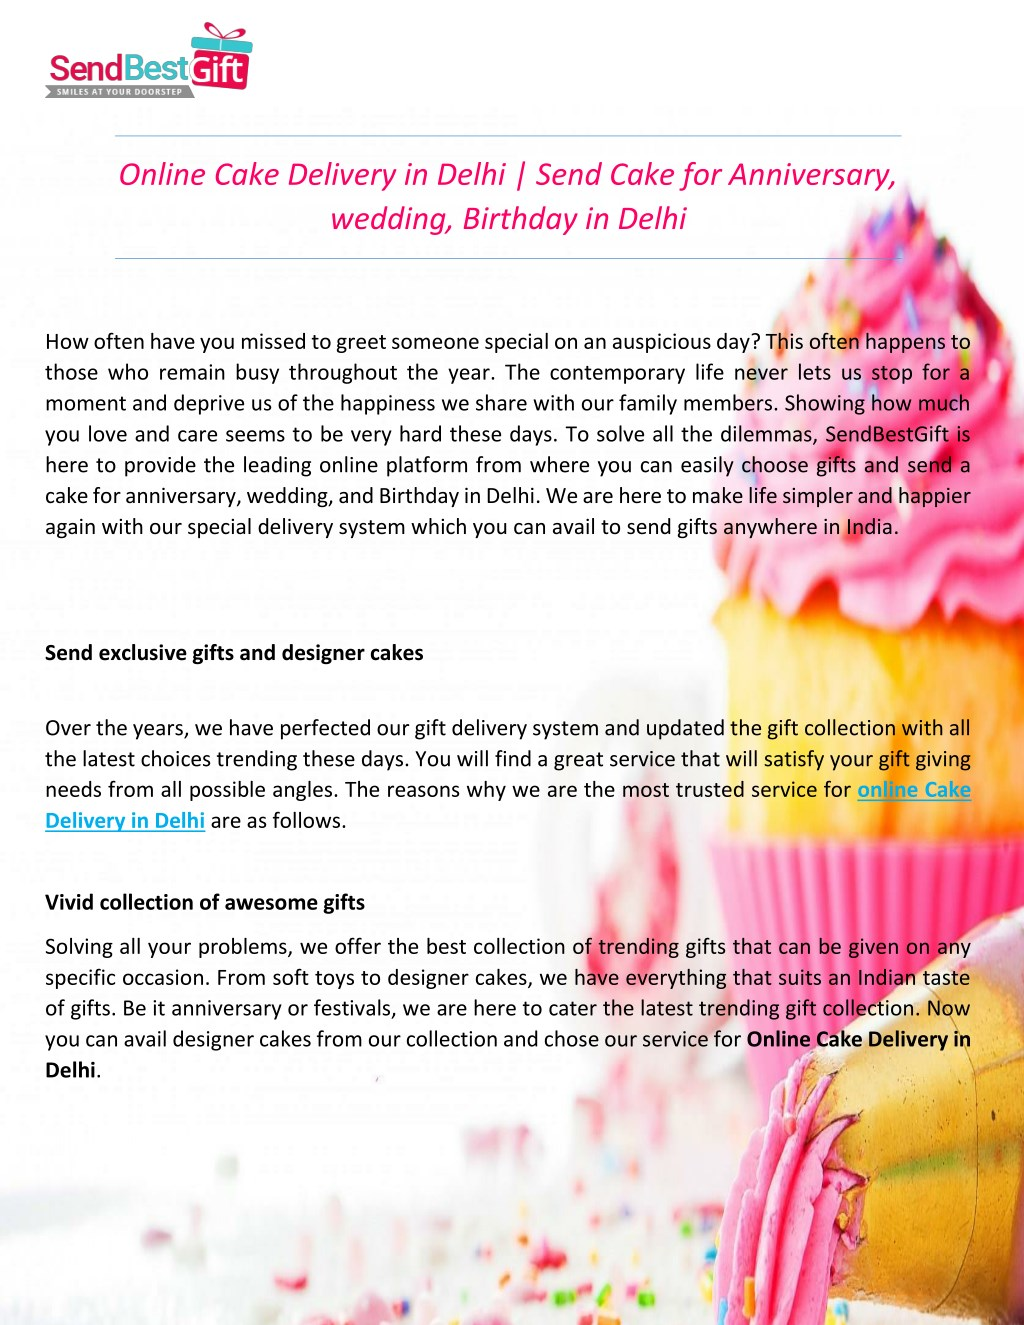 Online Cake Delivery In Delhi Send N